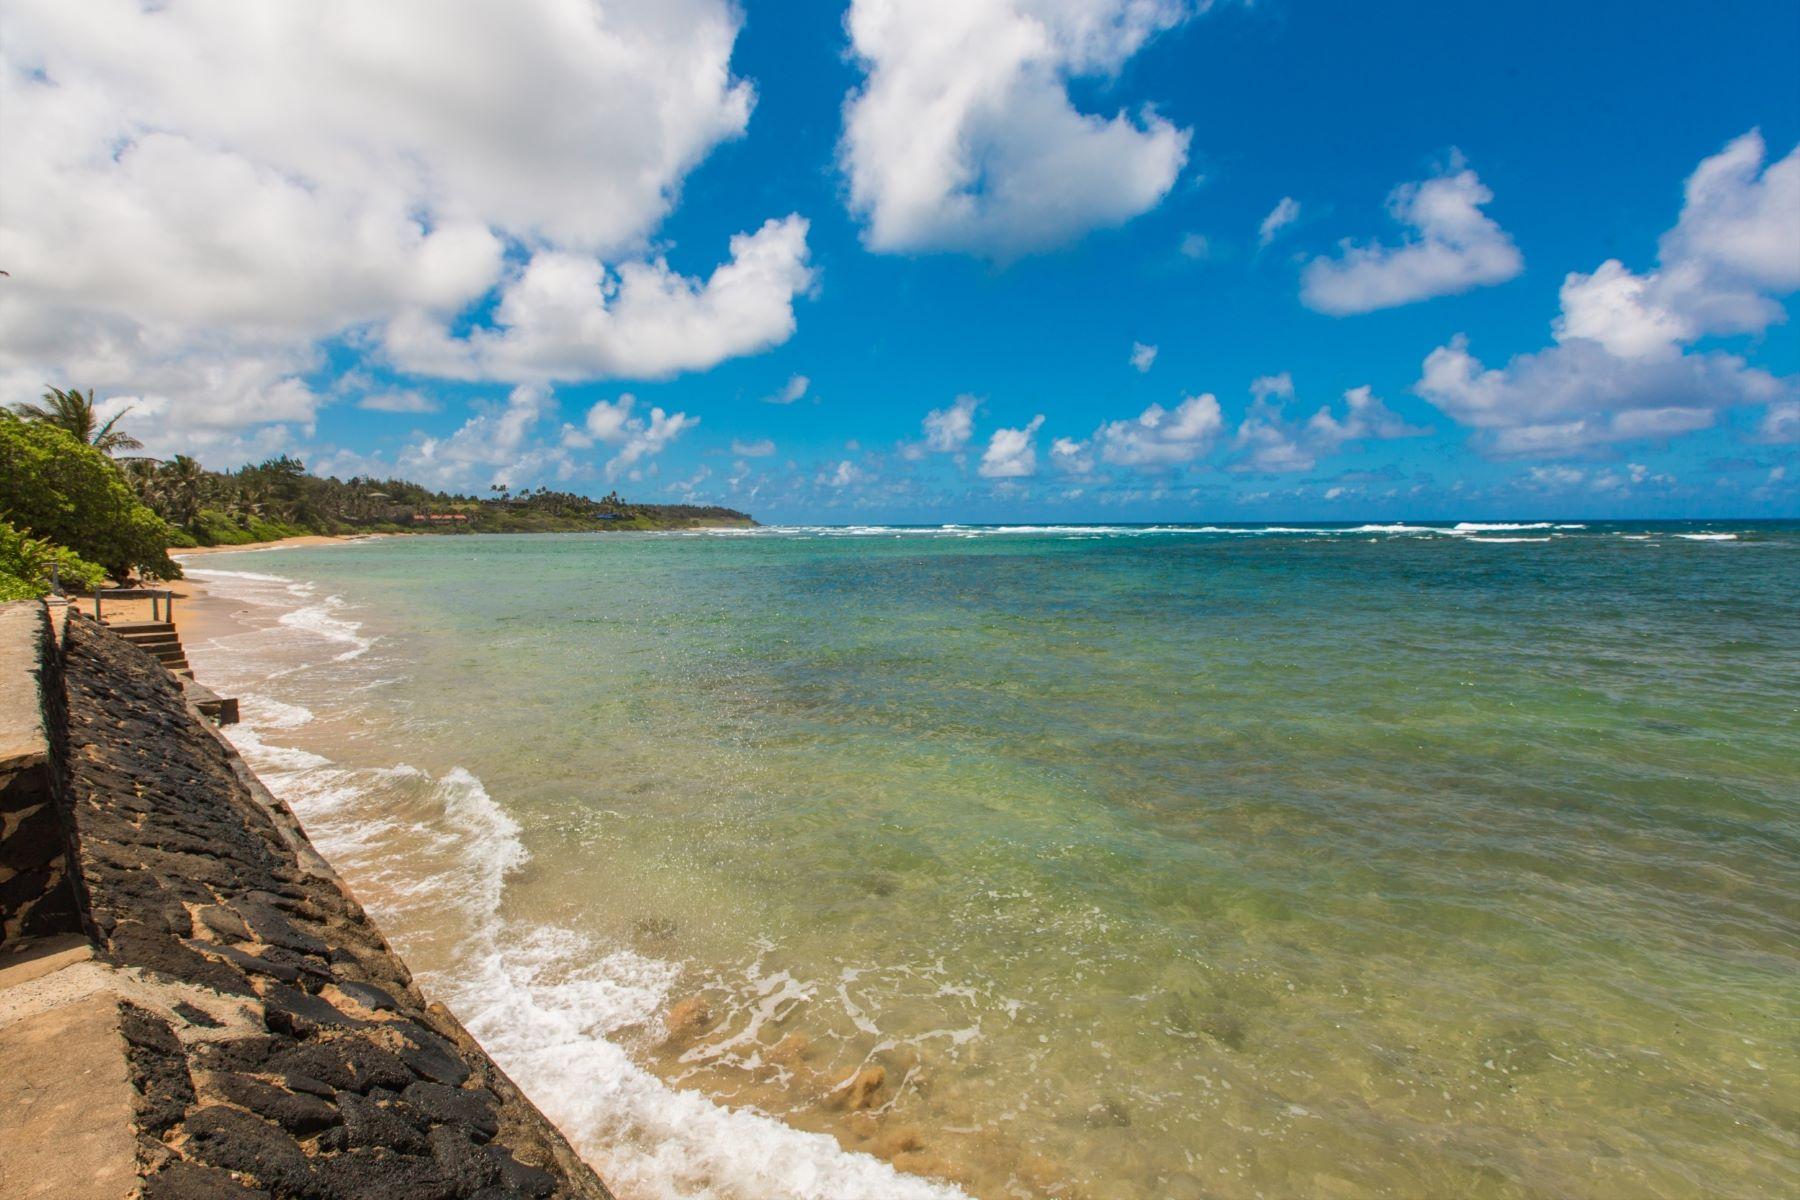 独户住宅 为 销售 在 Amazing Ocean Views in Sunny Anahola 4920 Aliomanu Road 阿纳霍拉, 夏威夷, 96703 美国